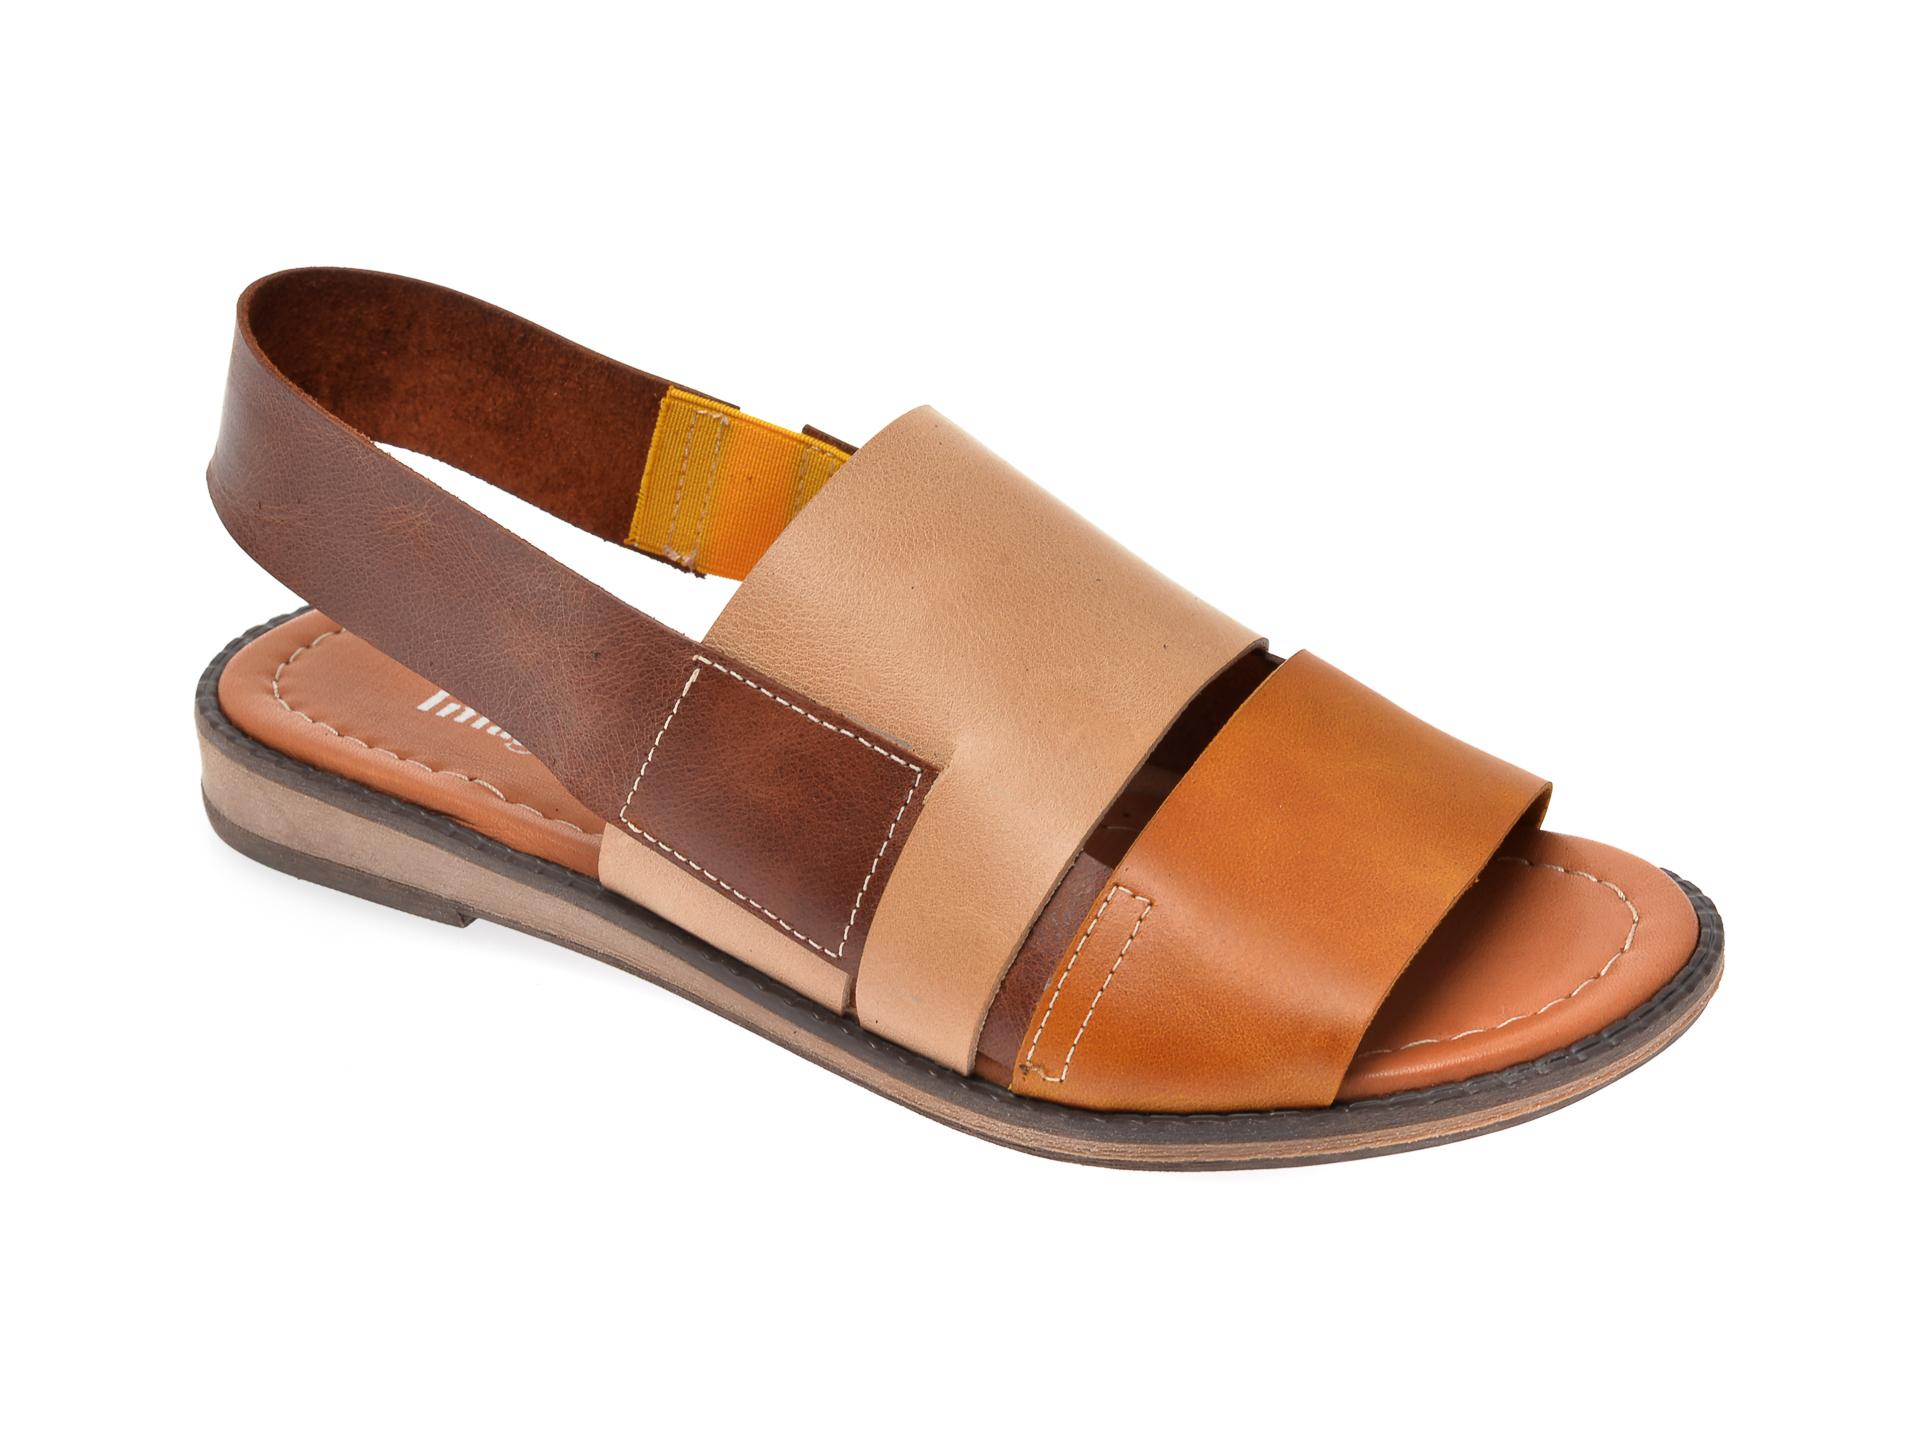 Sandale IMAGE bej, 122, din piele naturala imagine